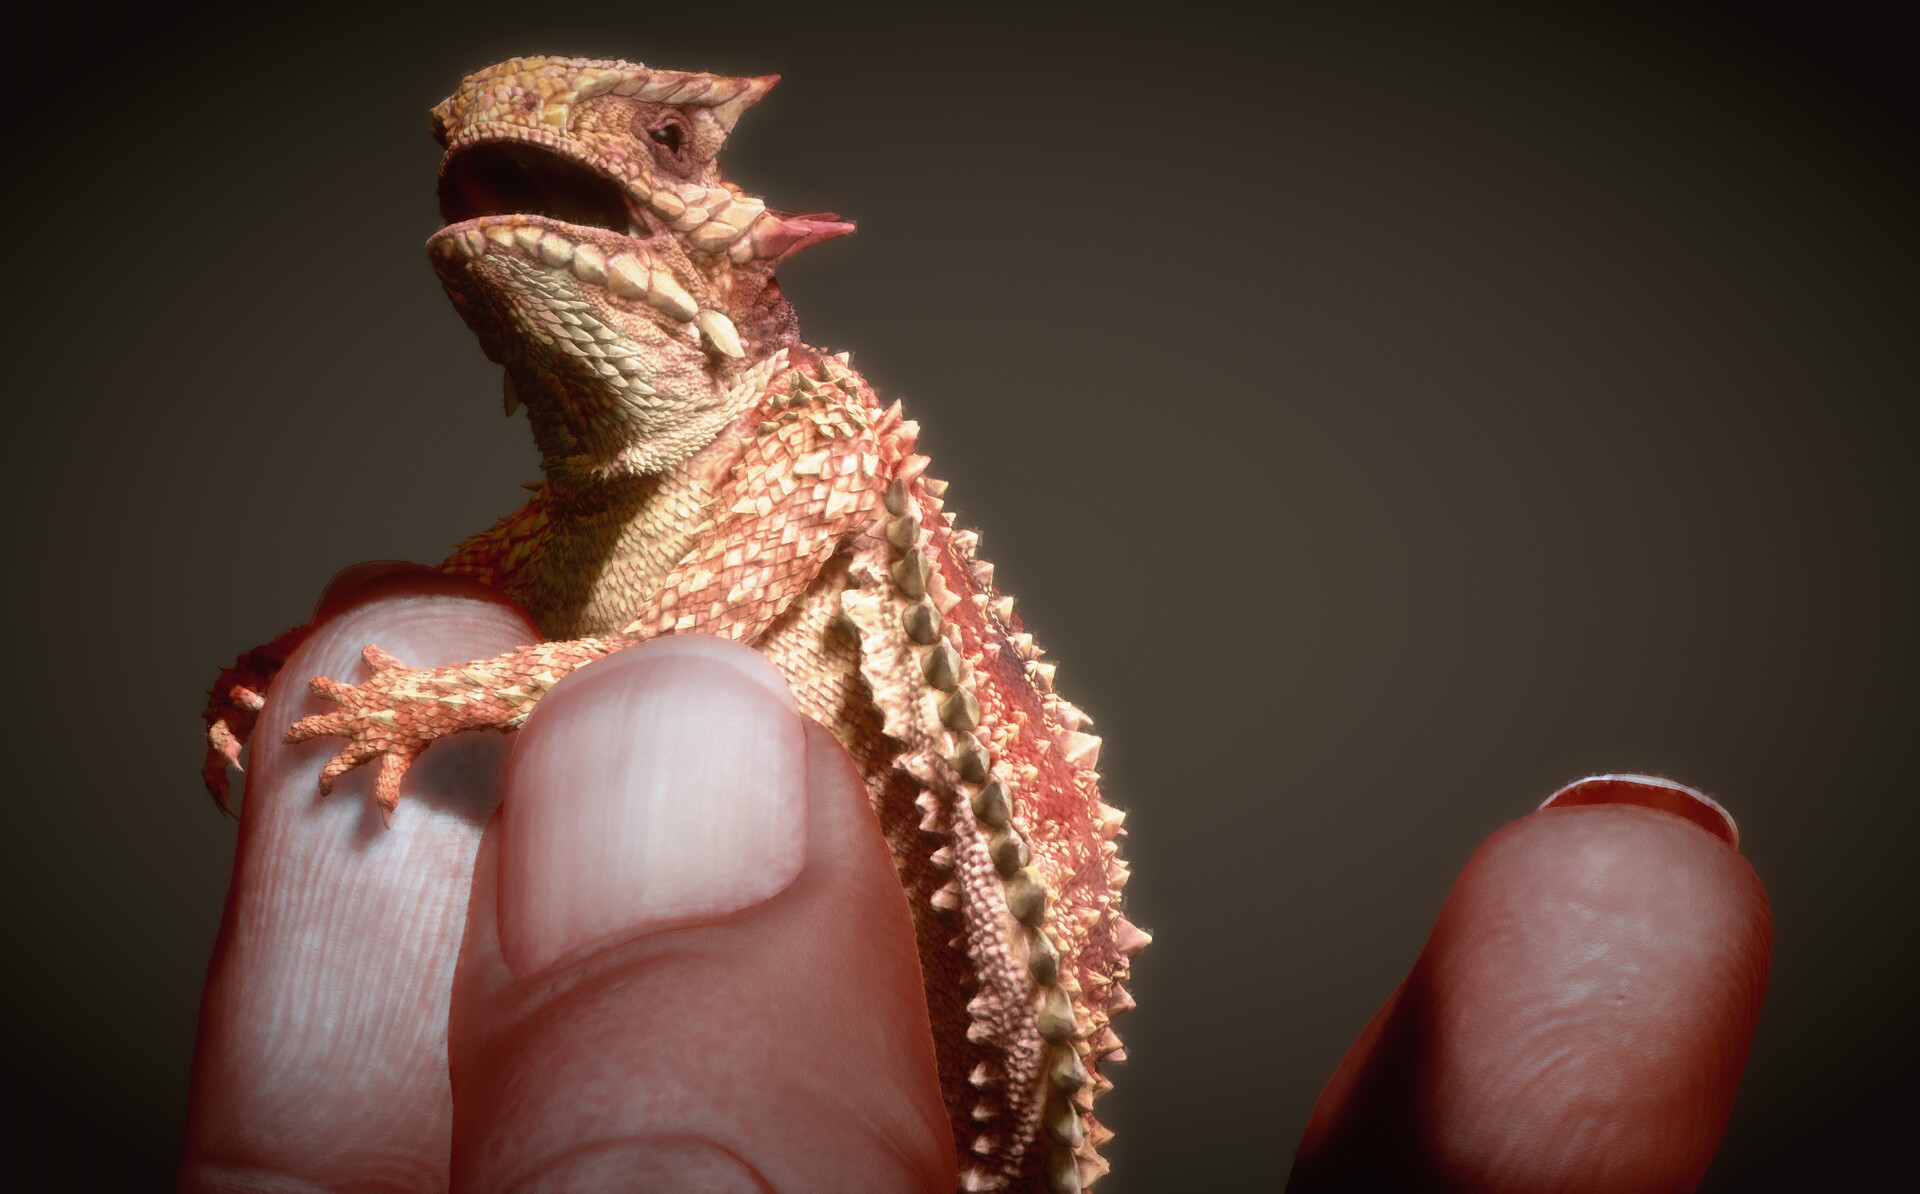 Eric keller keller lizard 001